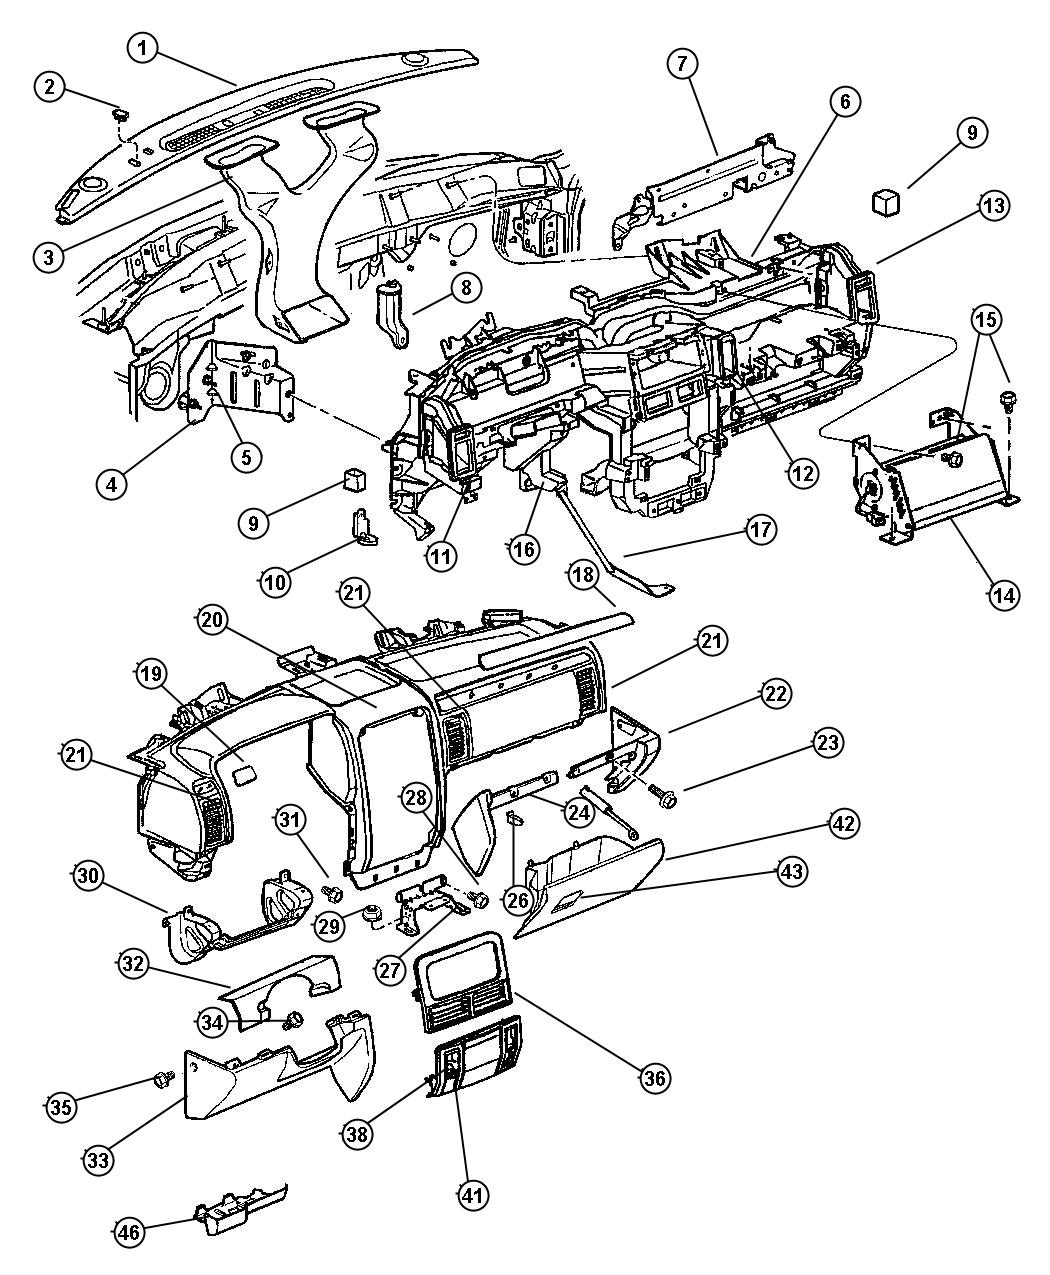 2004 Jeep Grand Cherokee Bezel. Driver. Instrument panel